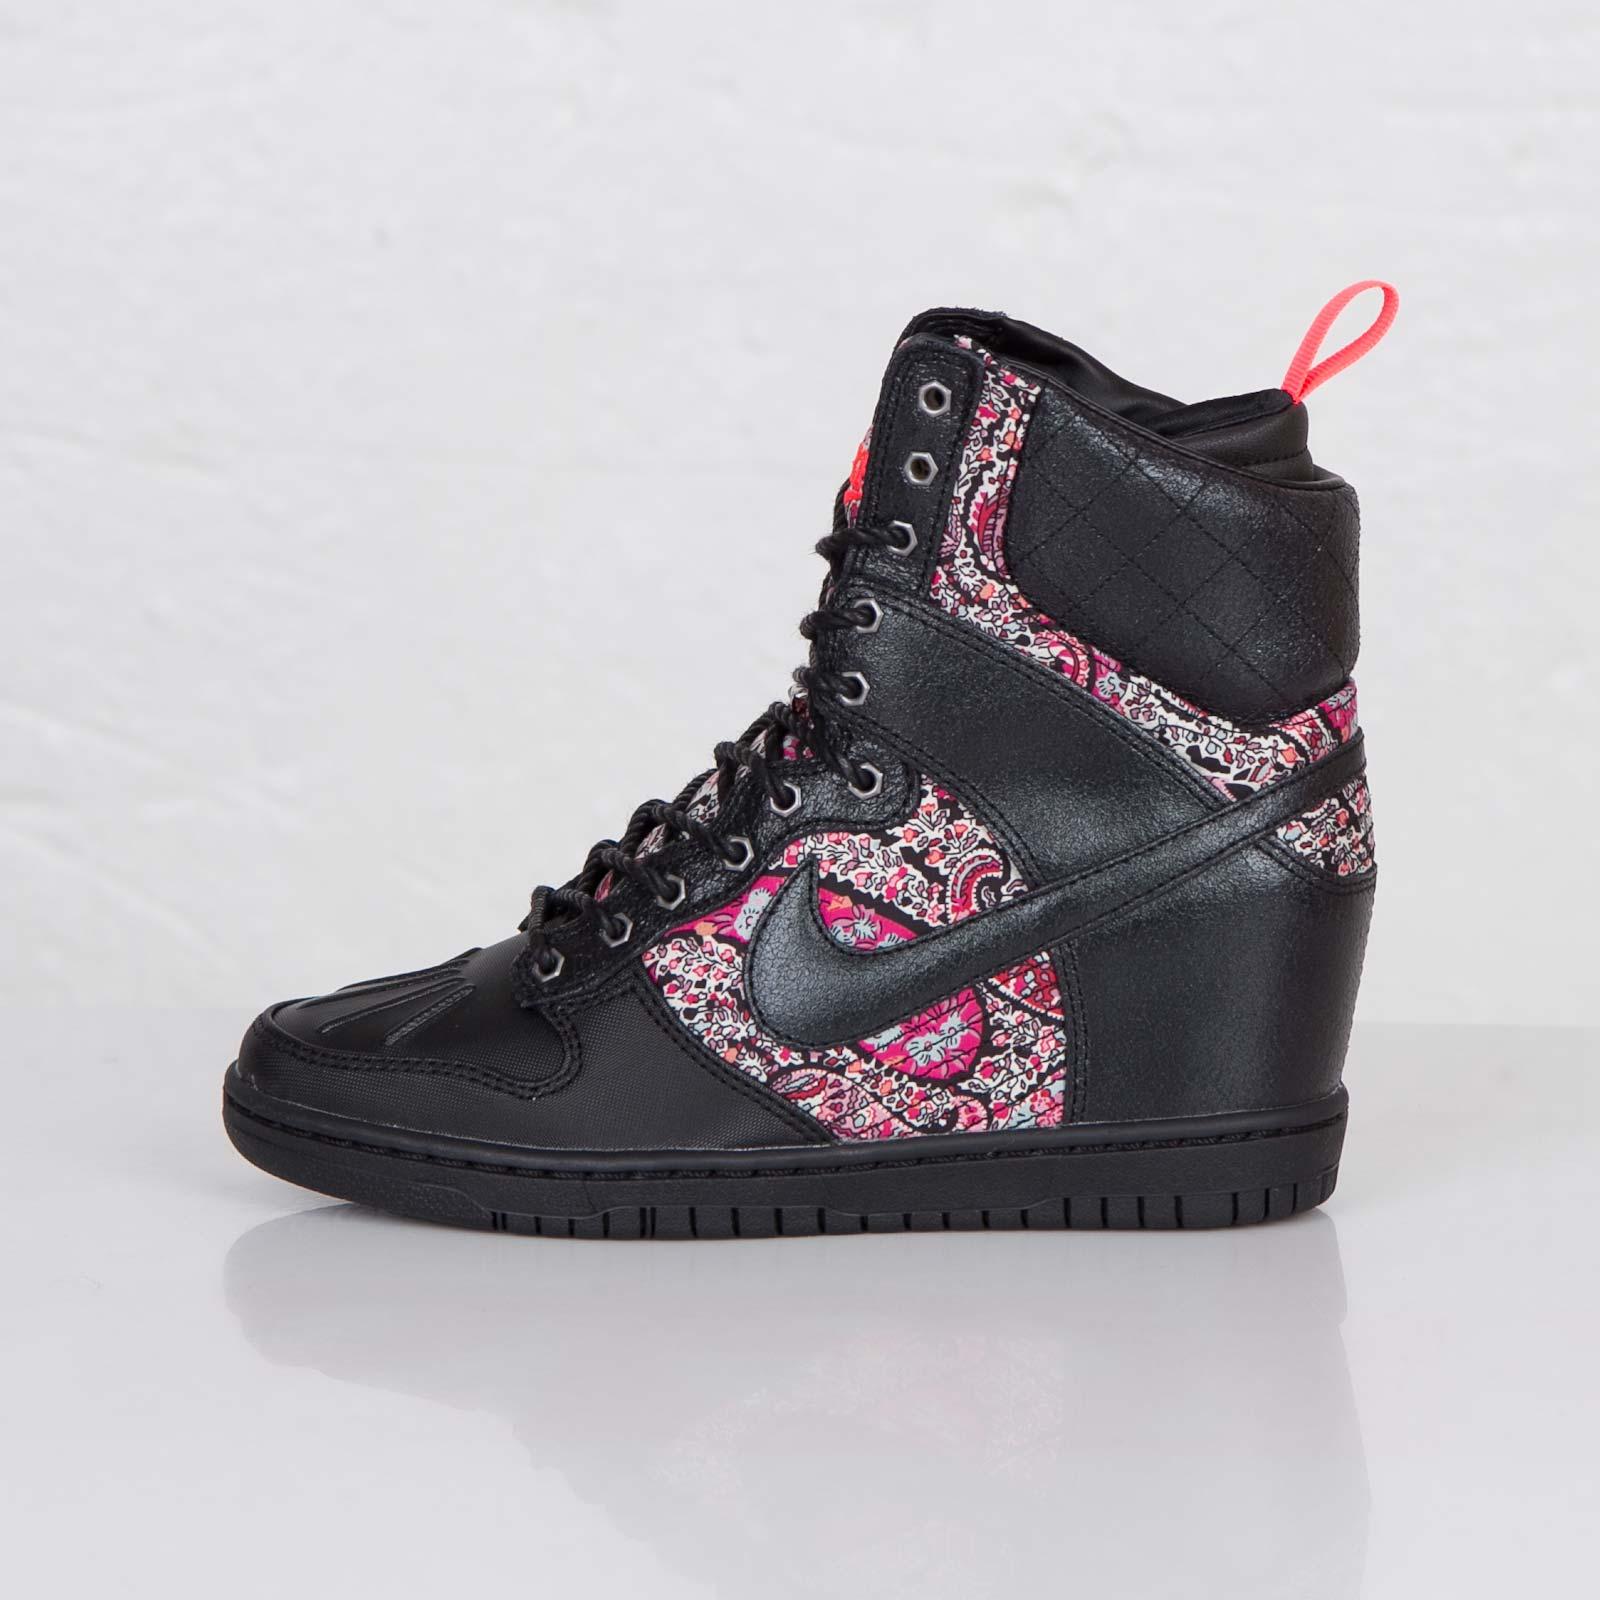 cheap for discount 53cbe 4fb4a Nike Wmns Dunk Sky Hi Sneakerboot Liberty QS - 632180-006 - Sneakersnstuff  | sneakers & streetwear online since 1999